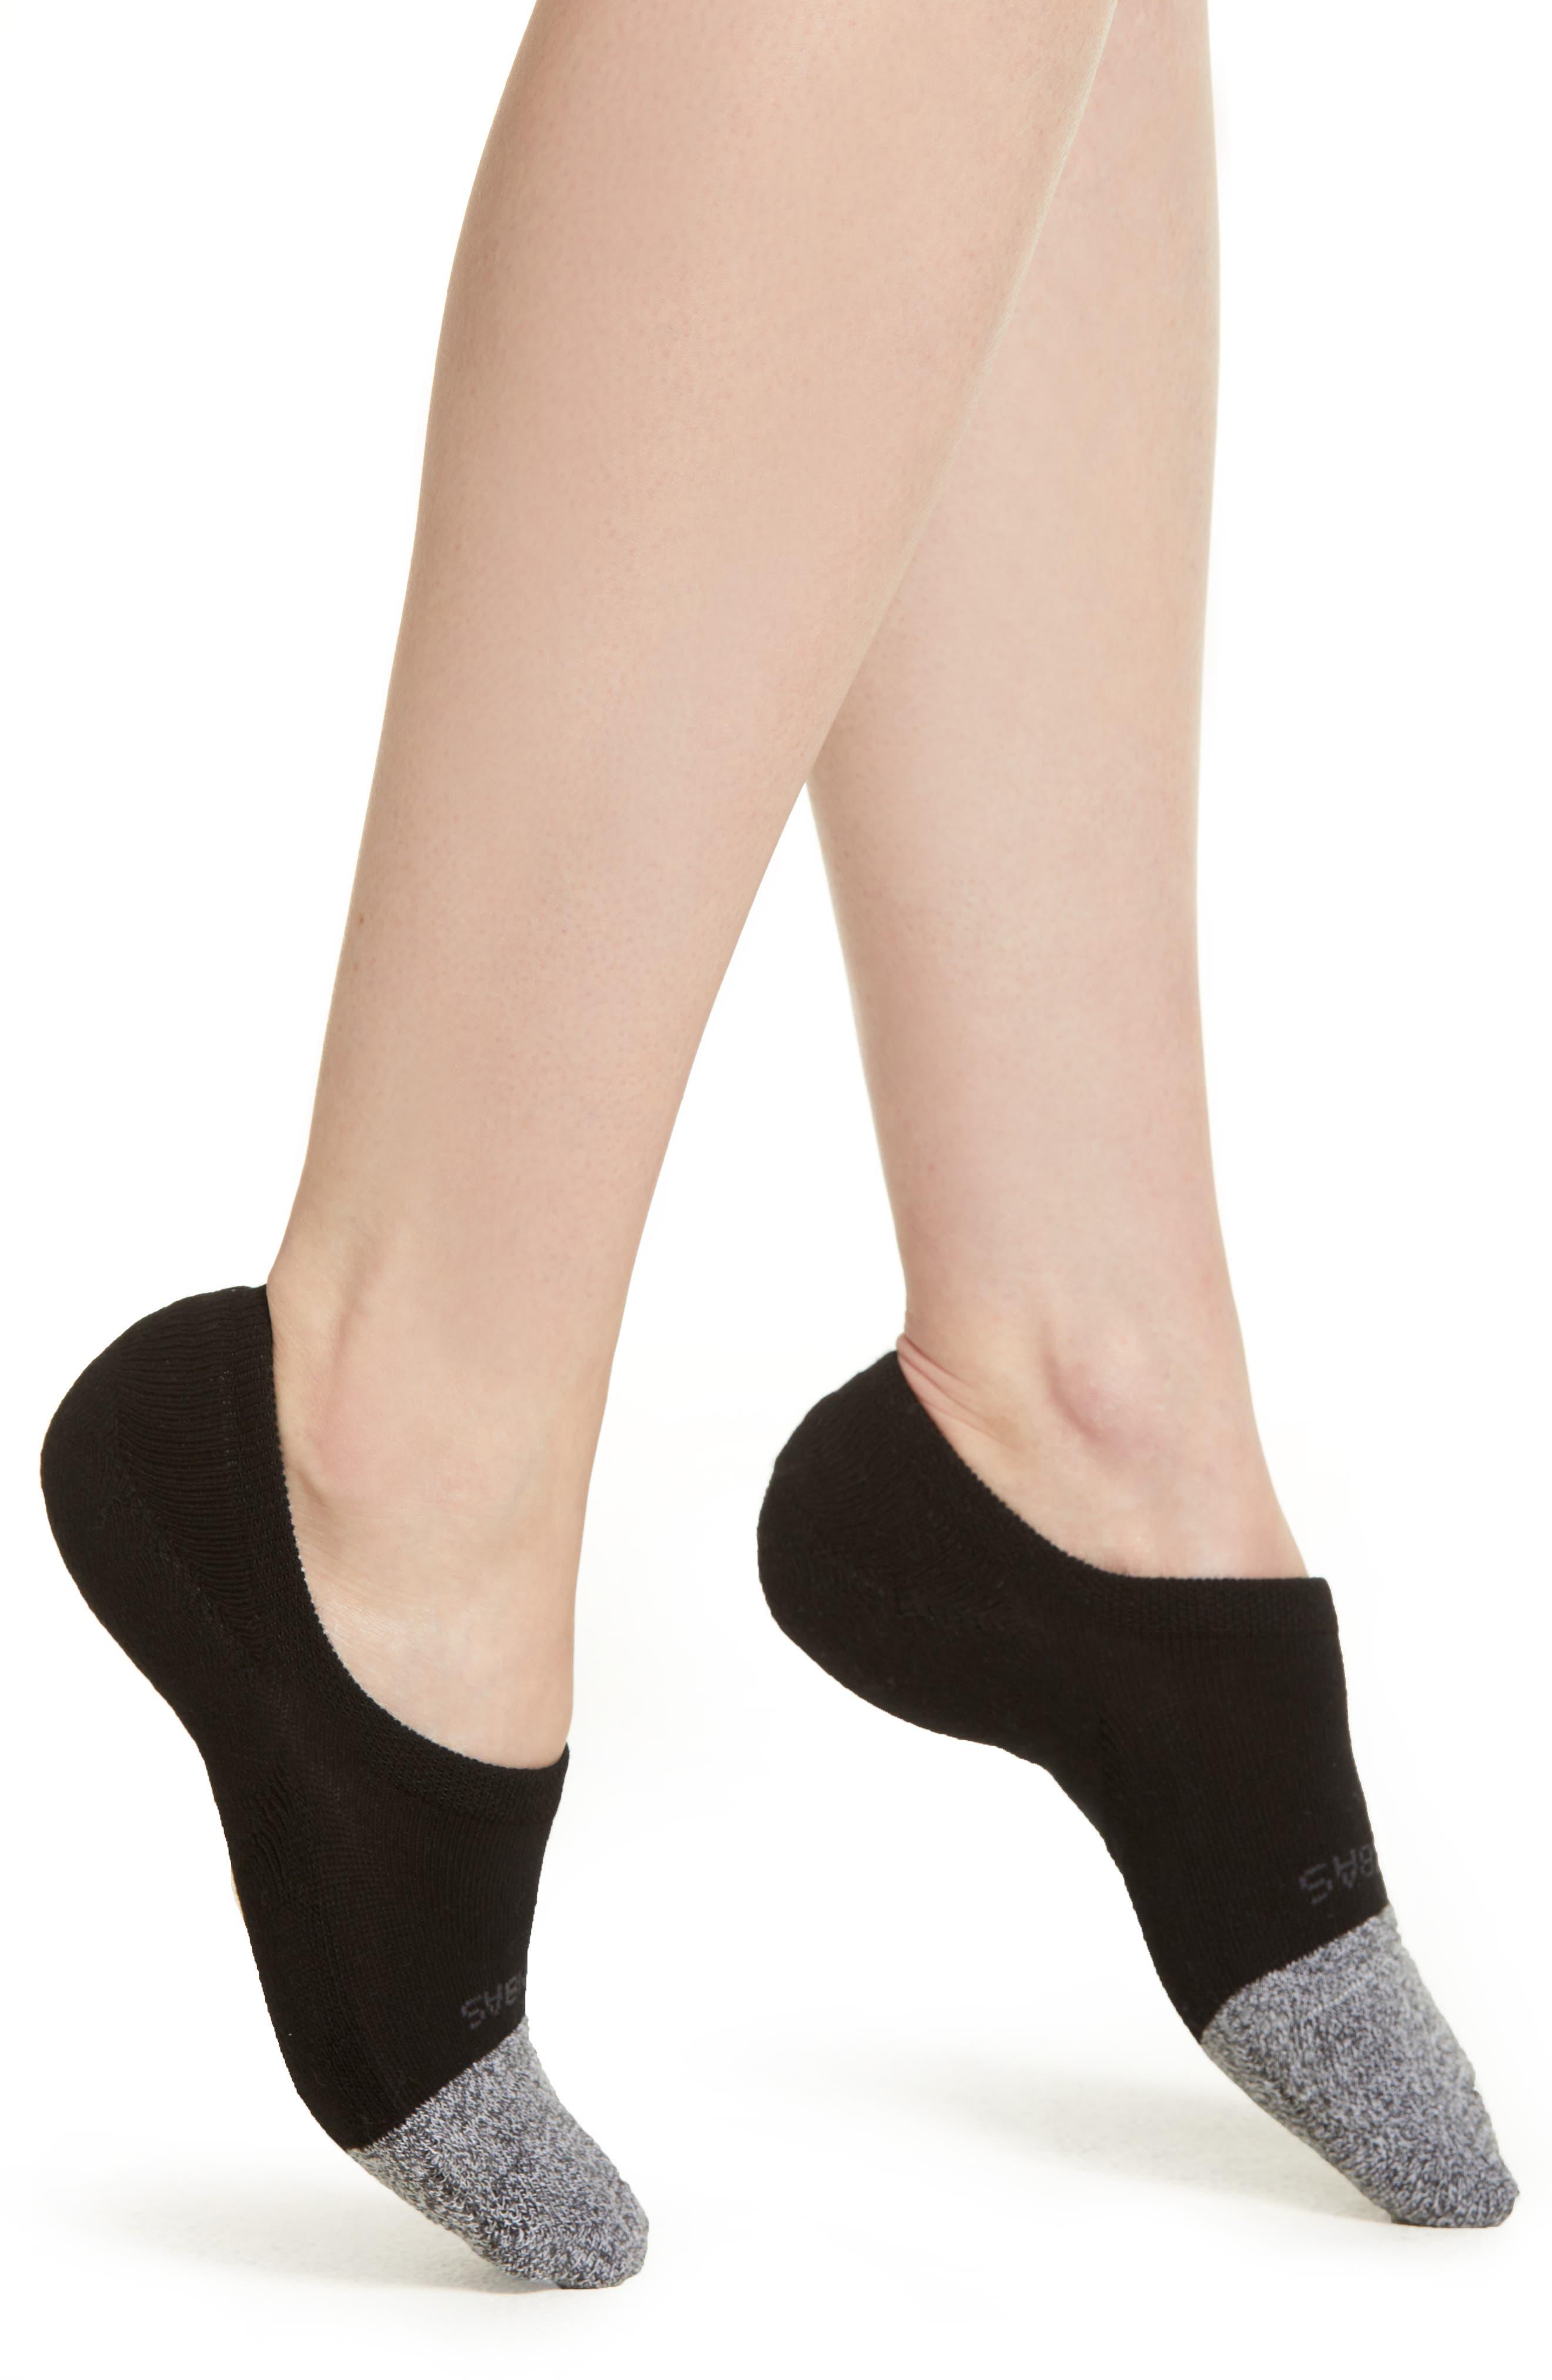 BOMBAS, Cushioned No-Show Socks, Main thumbnail 1, color, BLACK